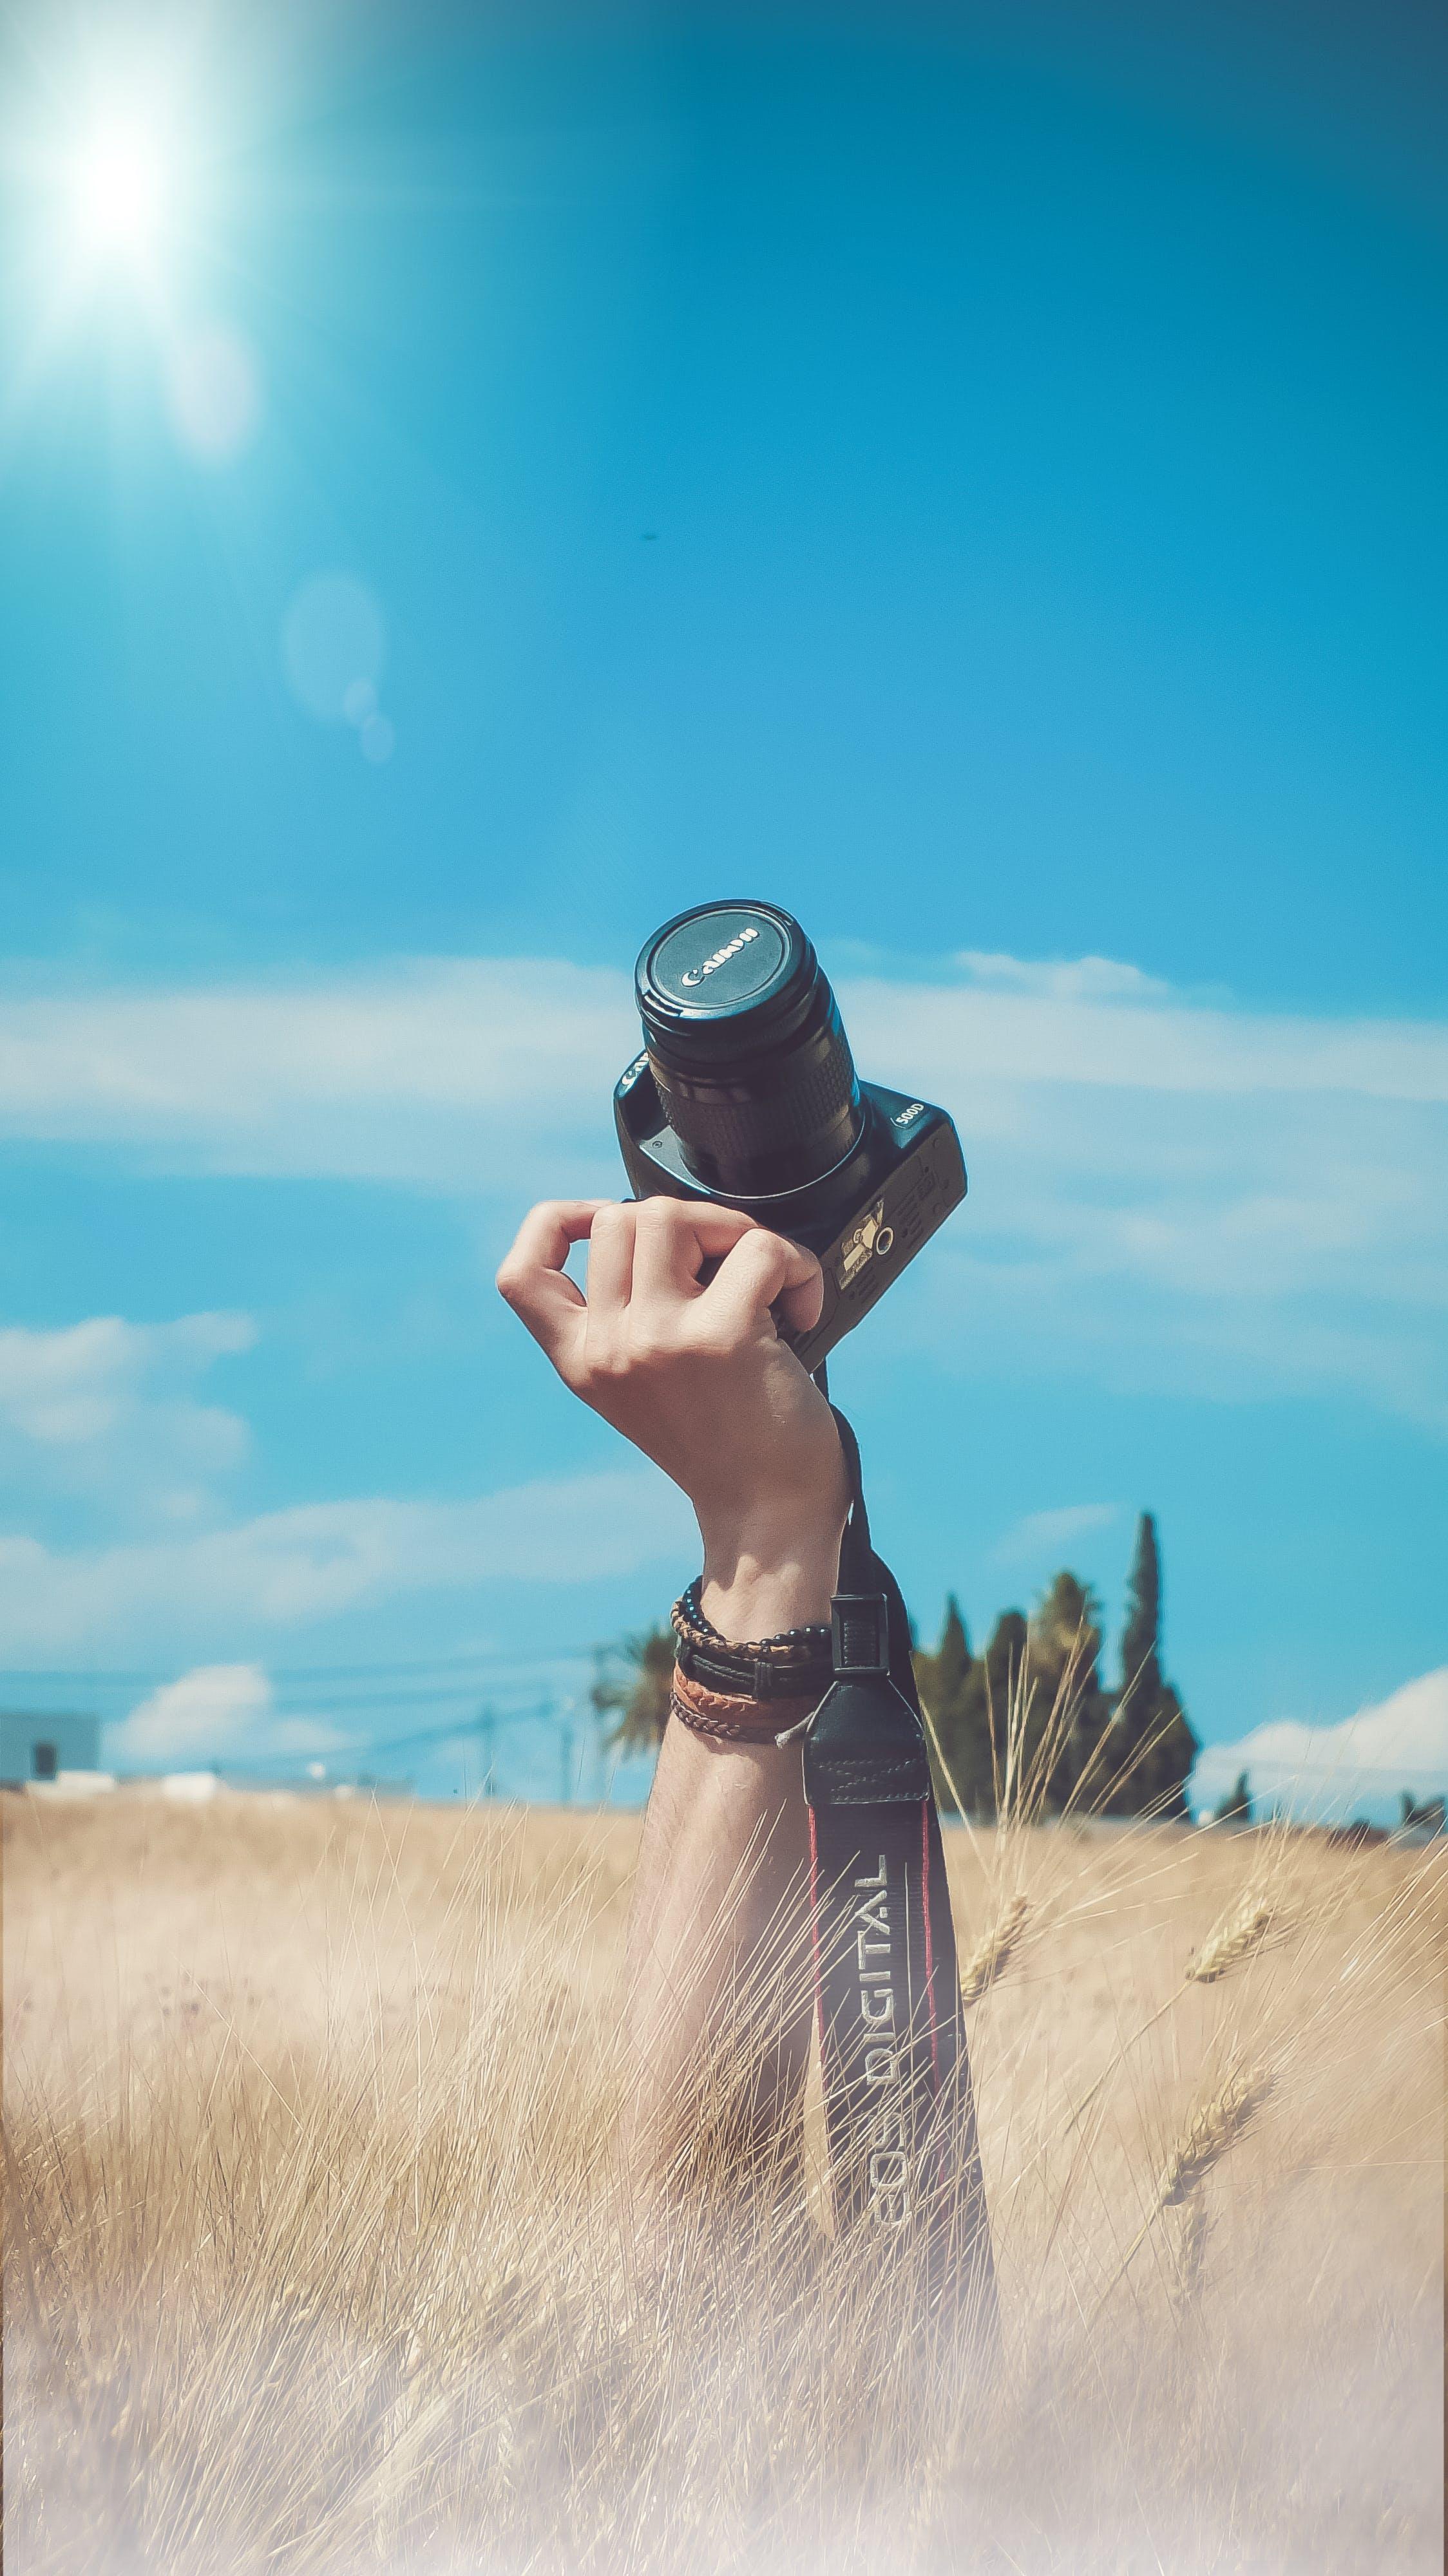 Gratis arkivbilde med avslapping, canon, fotograf, fritid